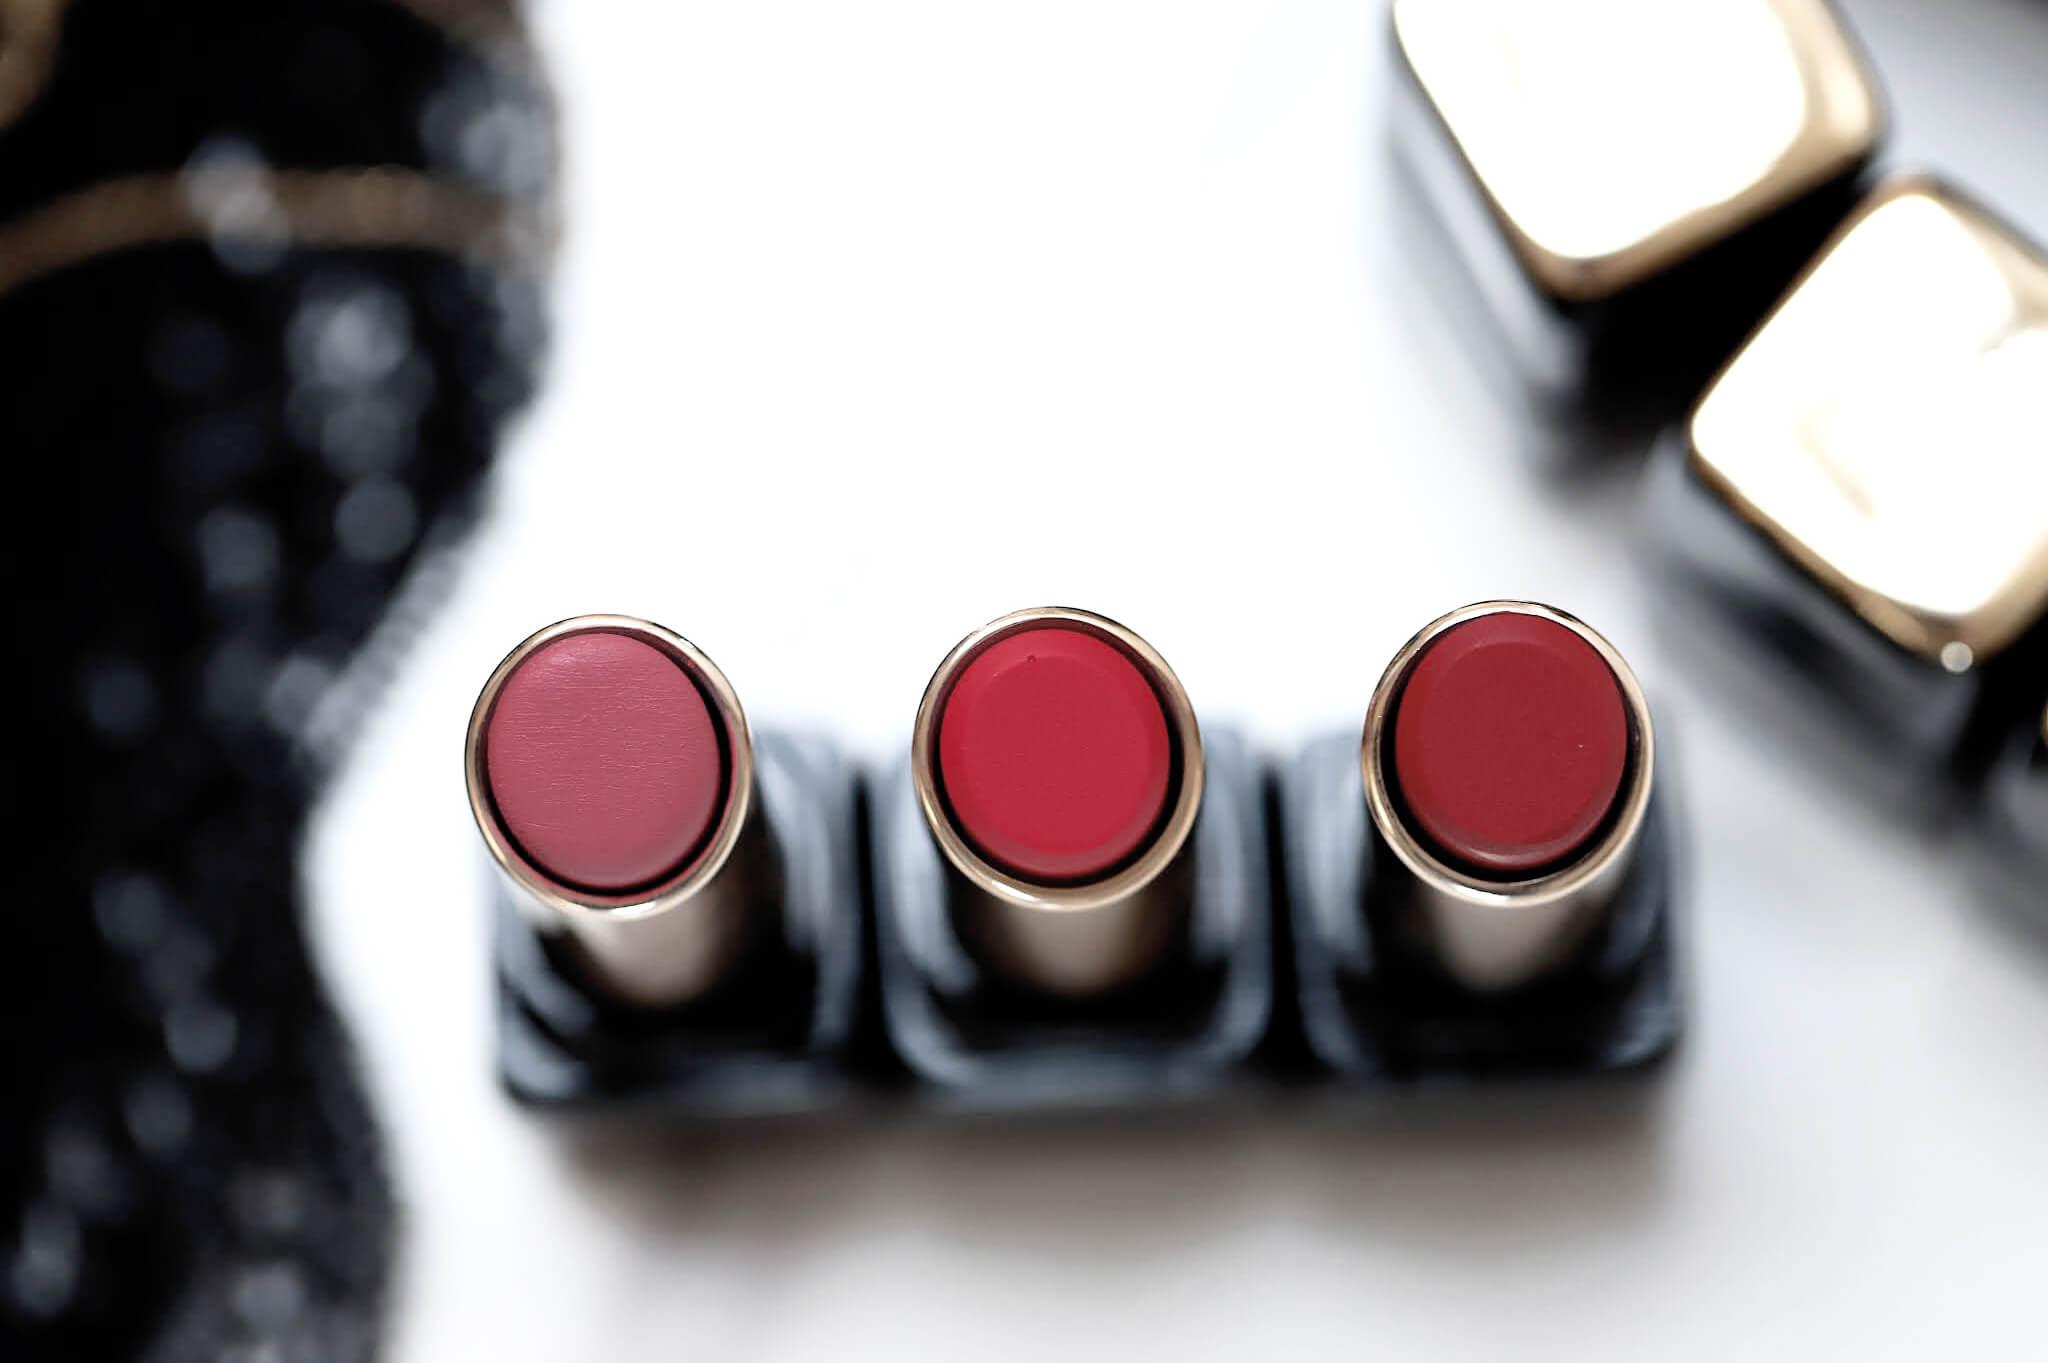 Guerlain Kiss Kiss tender Matte 940 My Rouge 219 Tender Rose 775 Kiss Rouge swatch